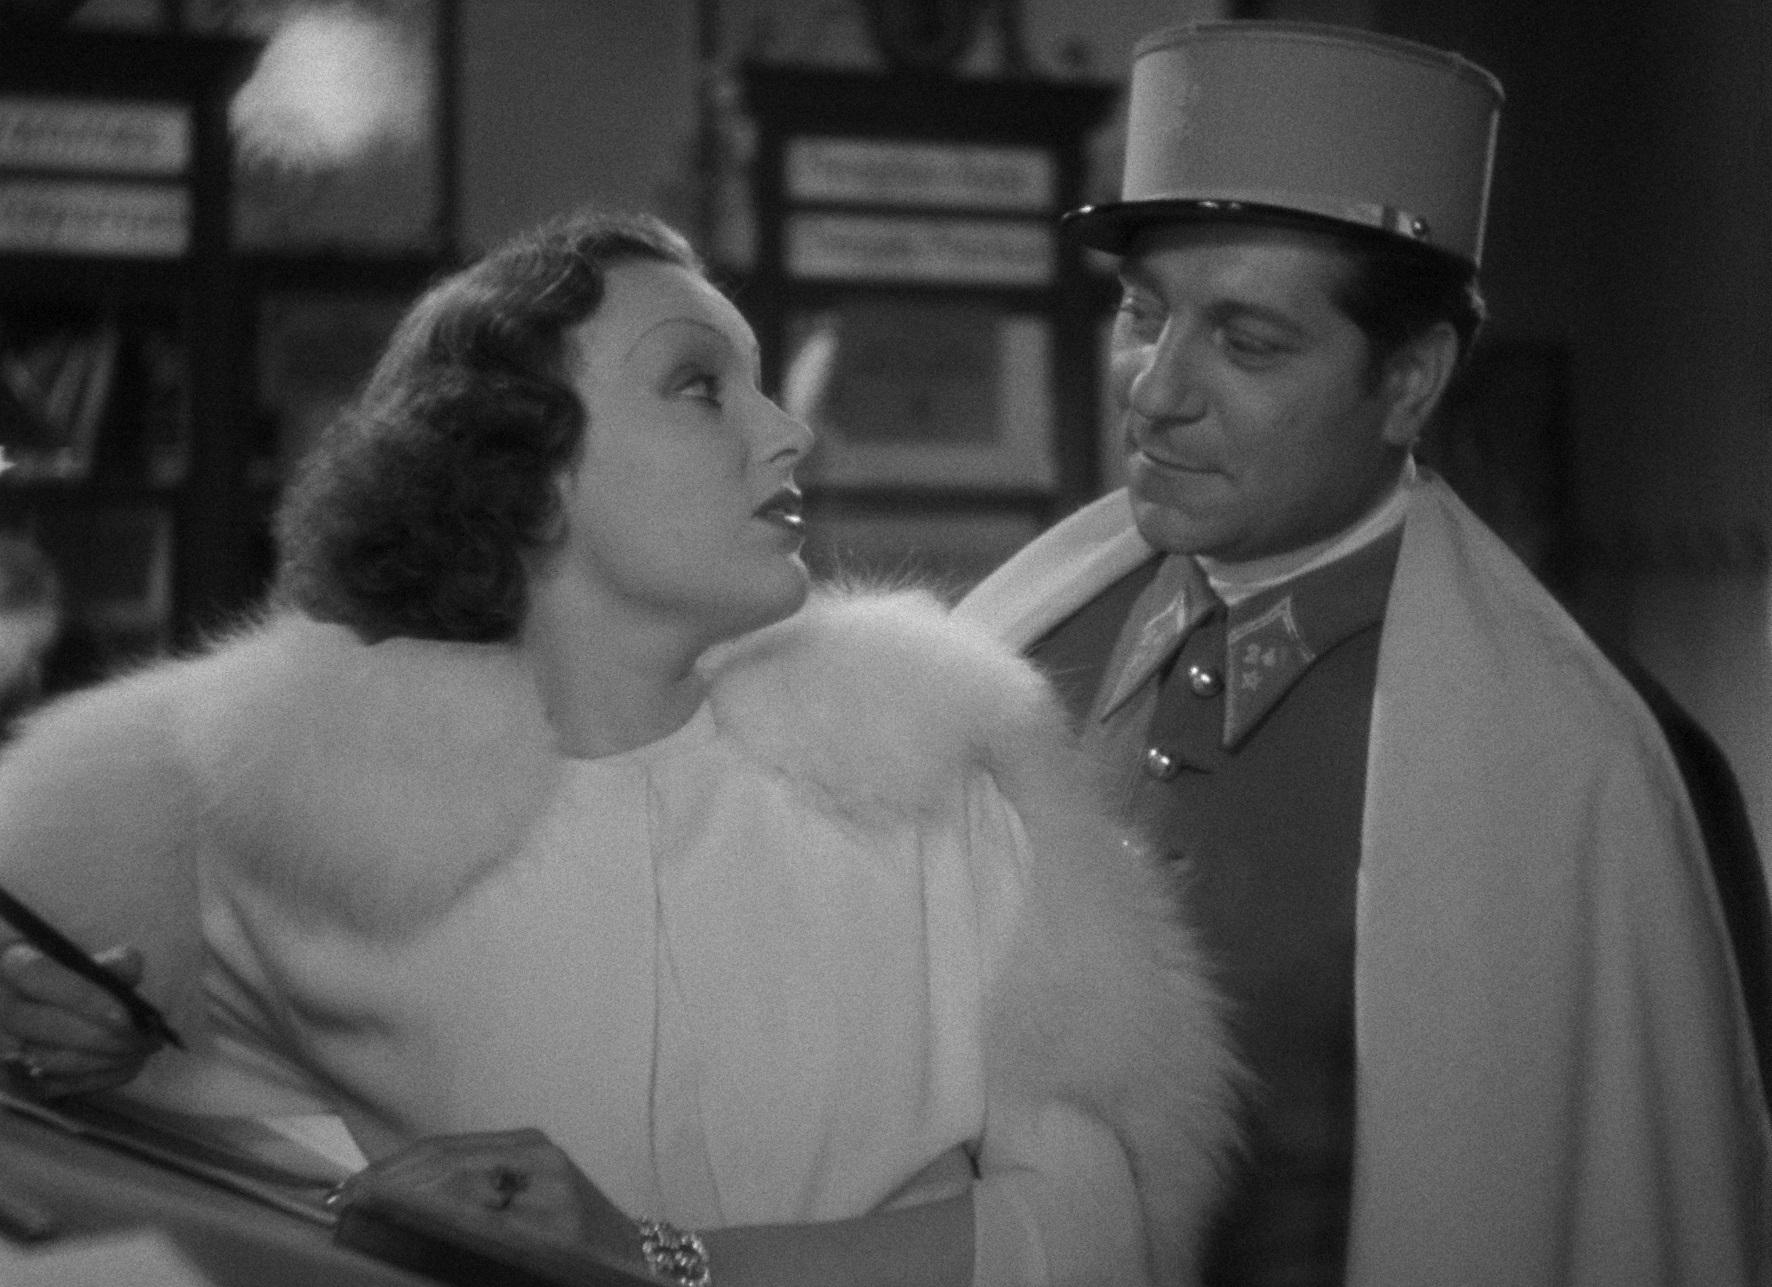 Mireille Balin and Jean Gabin in Gueule d'amour (1937)